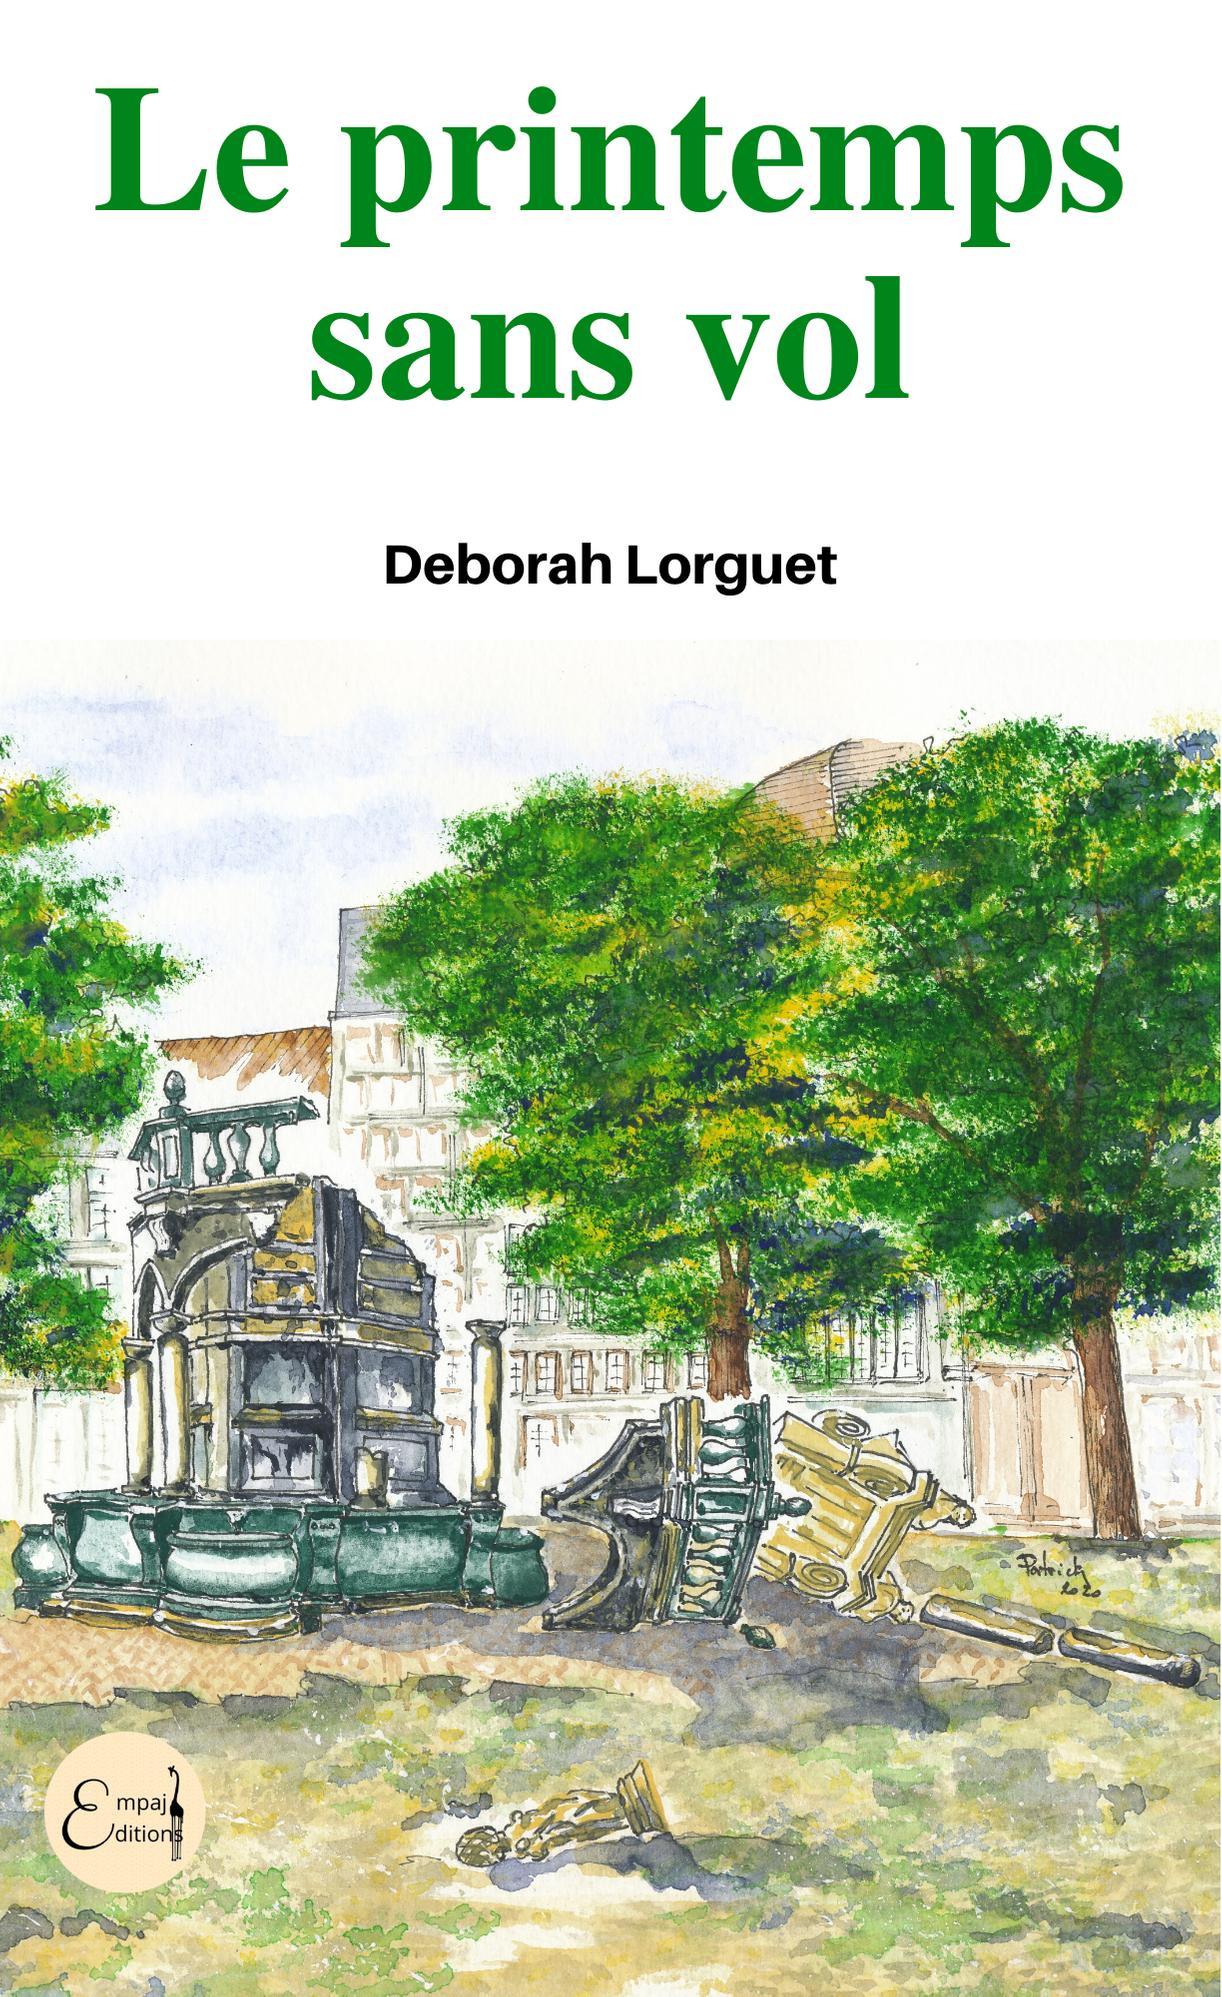 Deborah Lorguet